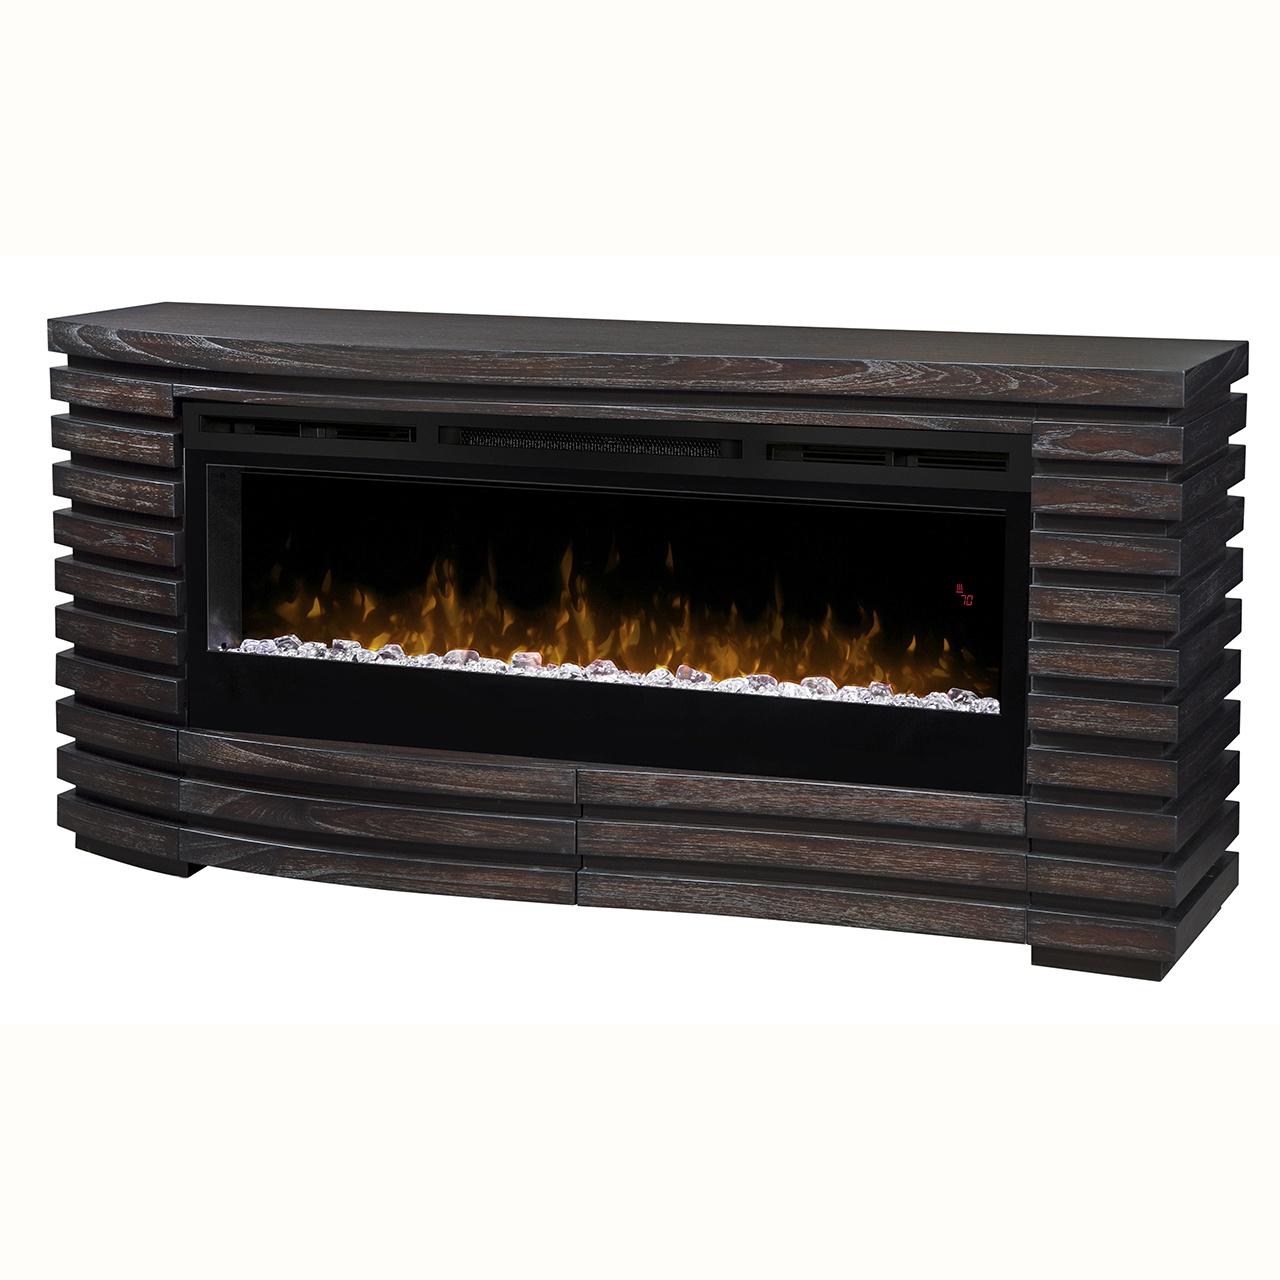 Dimplex Elliot Gds50g3 Ht Electric Fireplace Wall